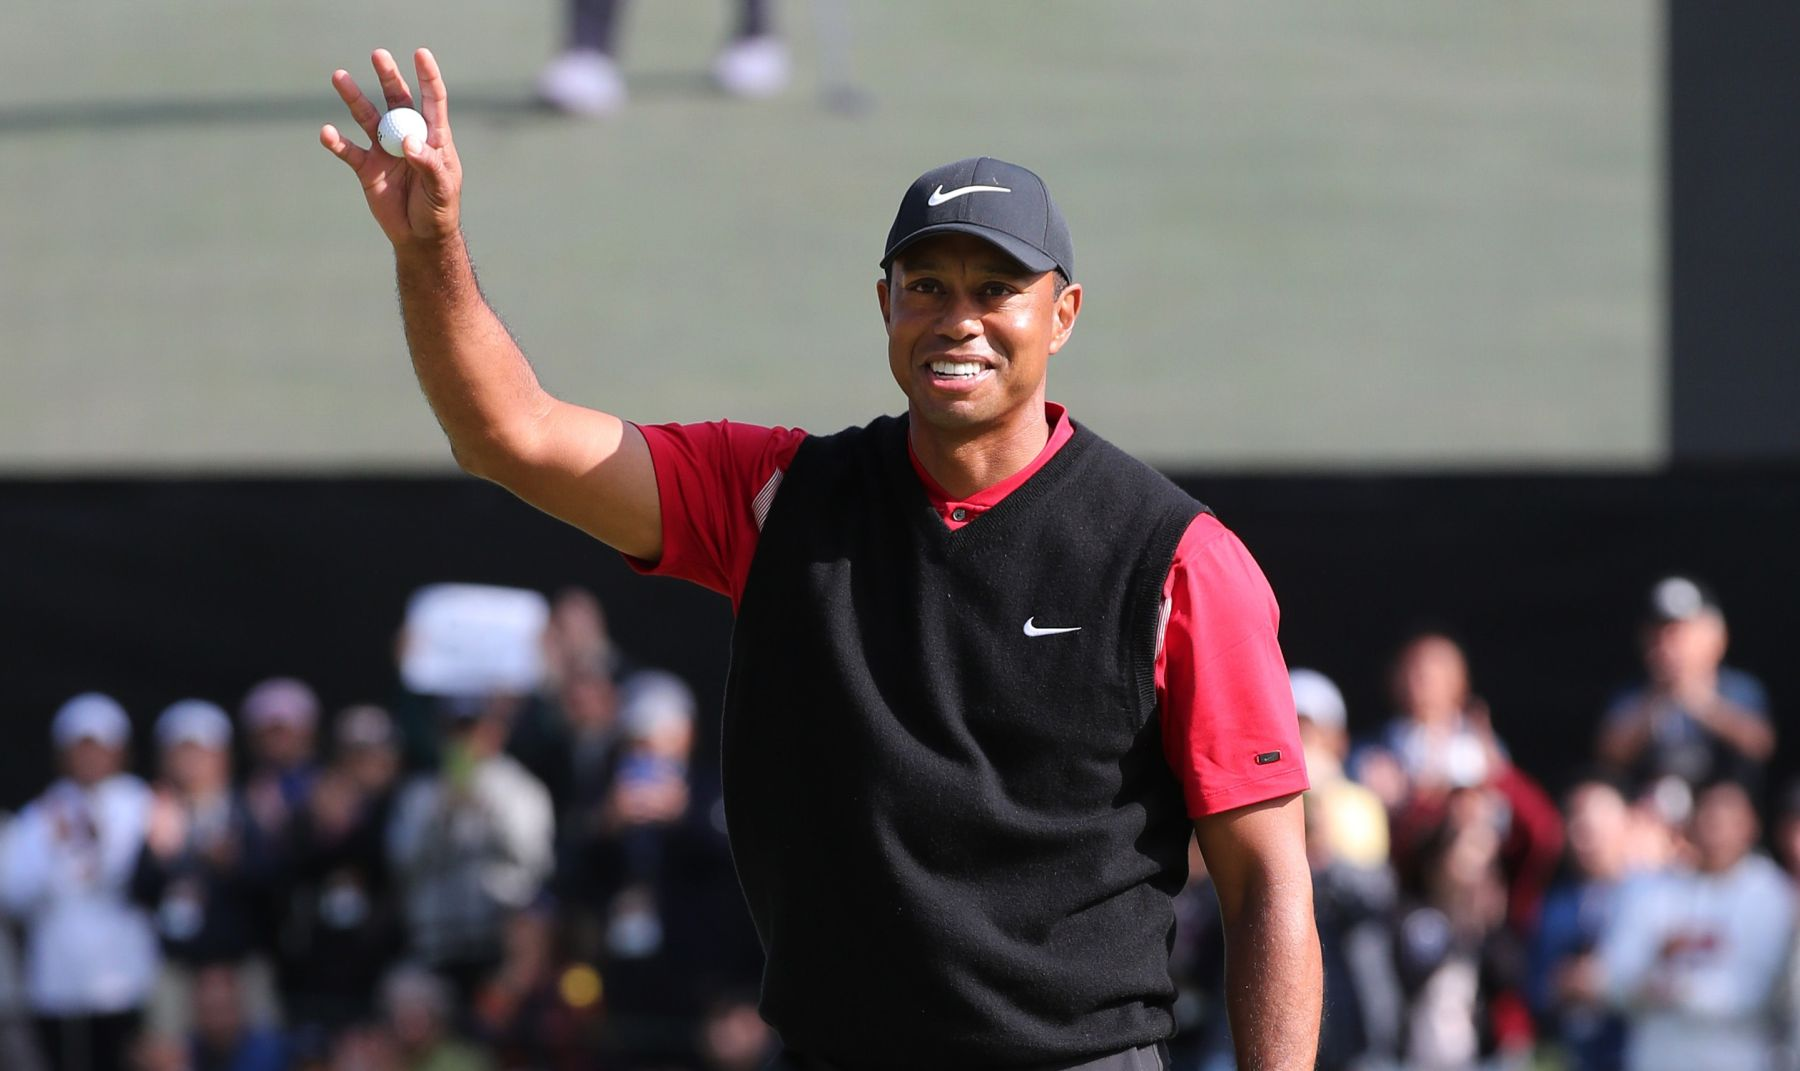 Tiger Woods 82 PGA Tour Win in Japan 002